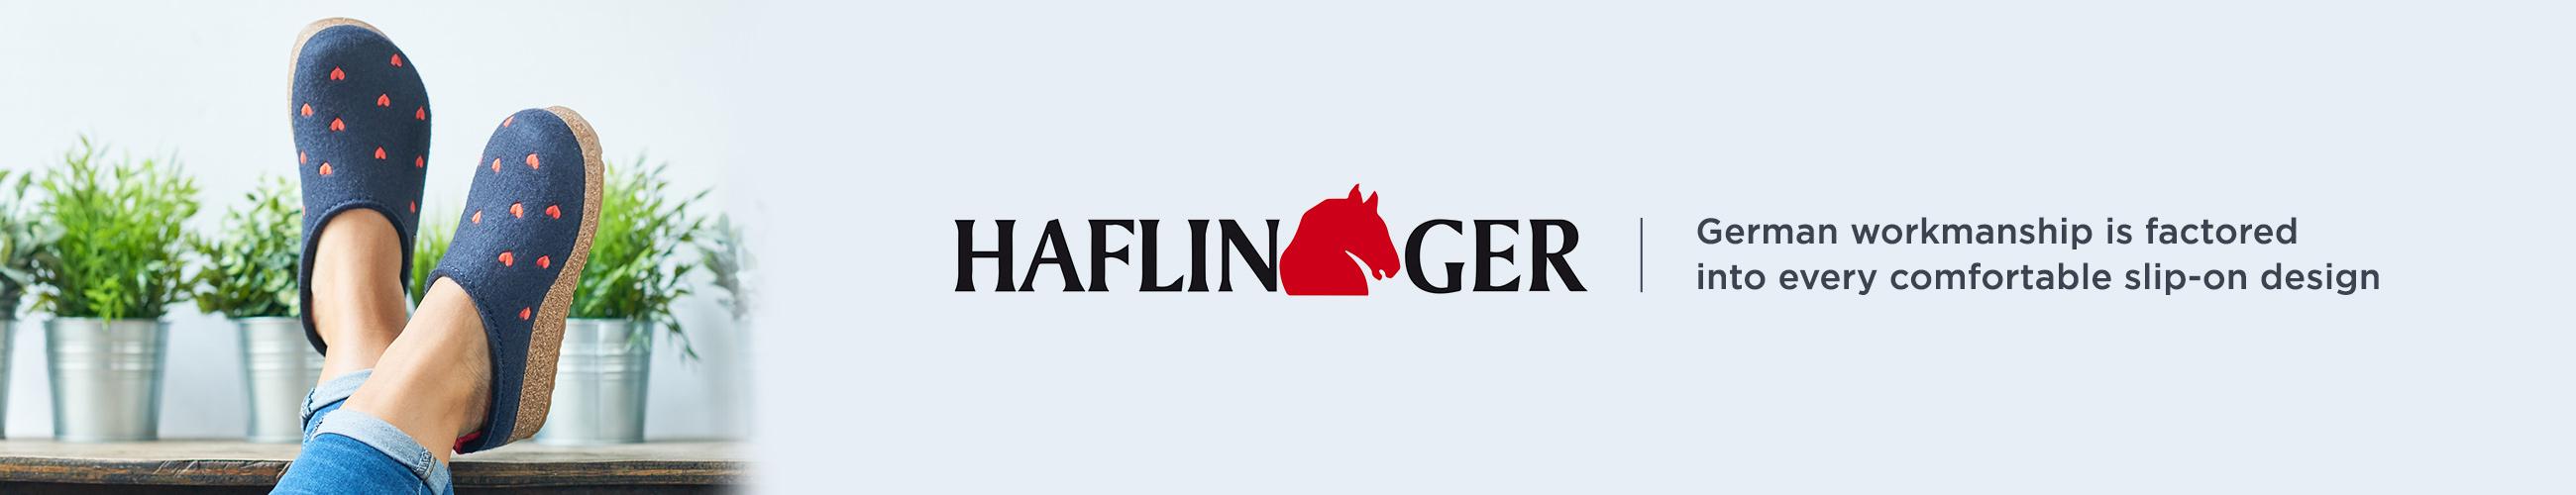 Haflinger. German workmanship is factored into every comfortable slip-on design